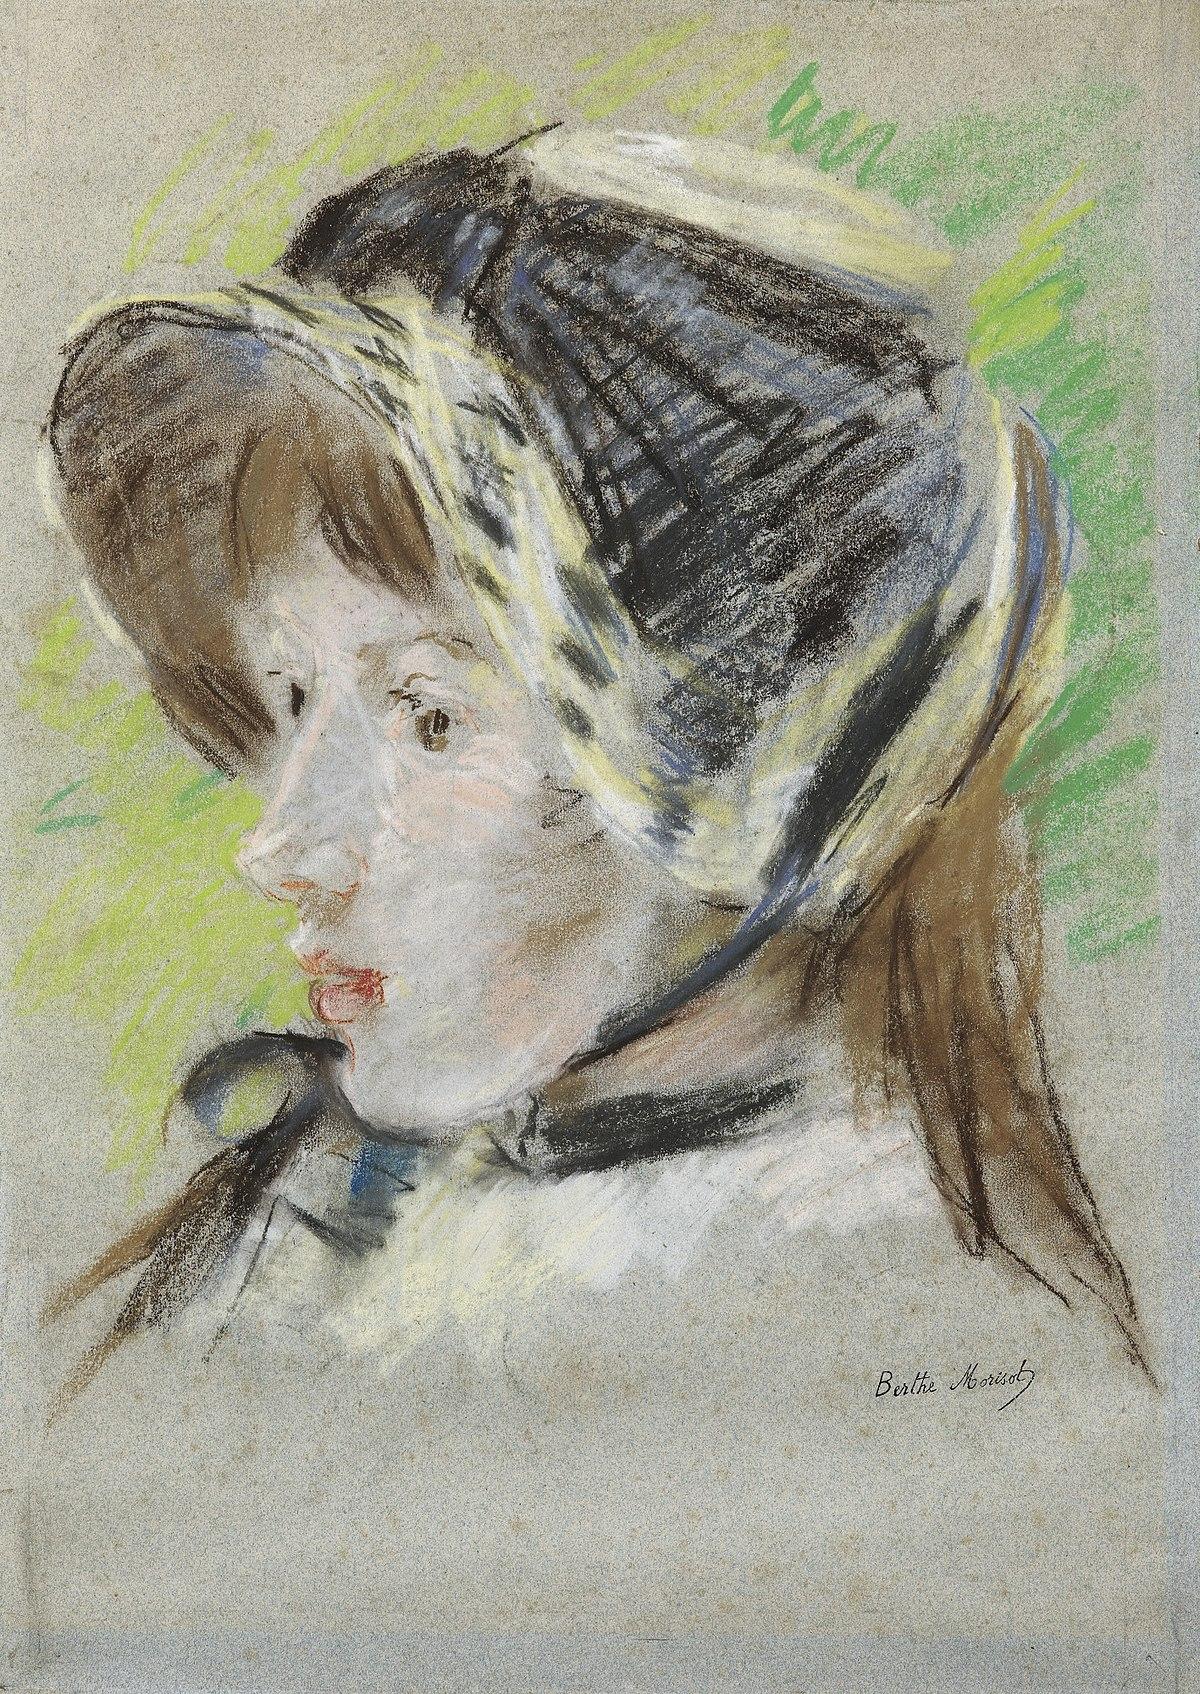 File:Morisot - JEANNE PONTILLON À LA CAPELINE, 1884.jpg - Wikimedia Commons